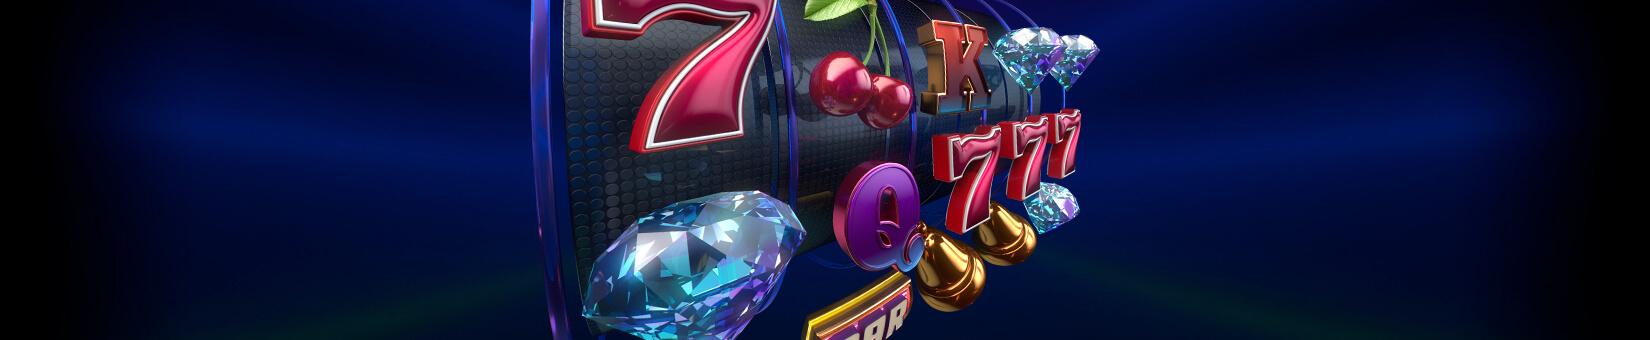 Pokerstar deportes casino online confiable Guyana-363480